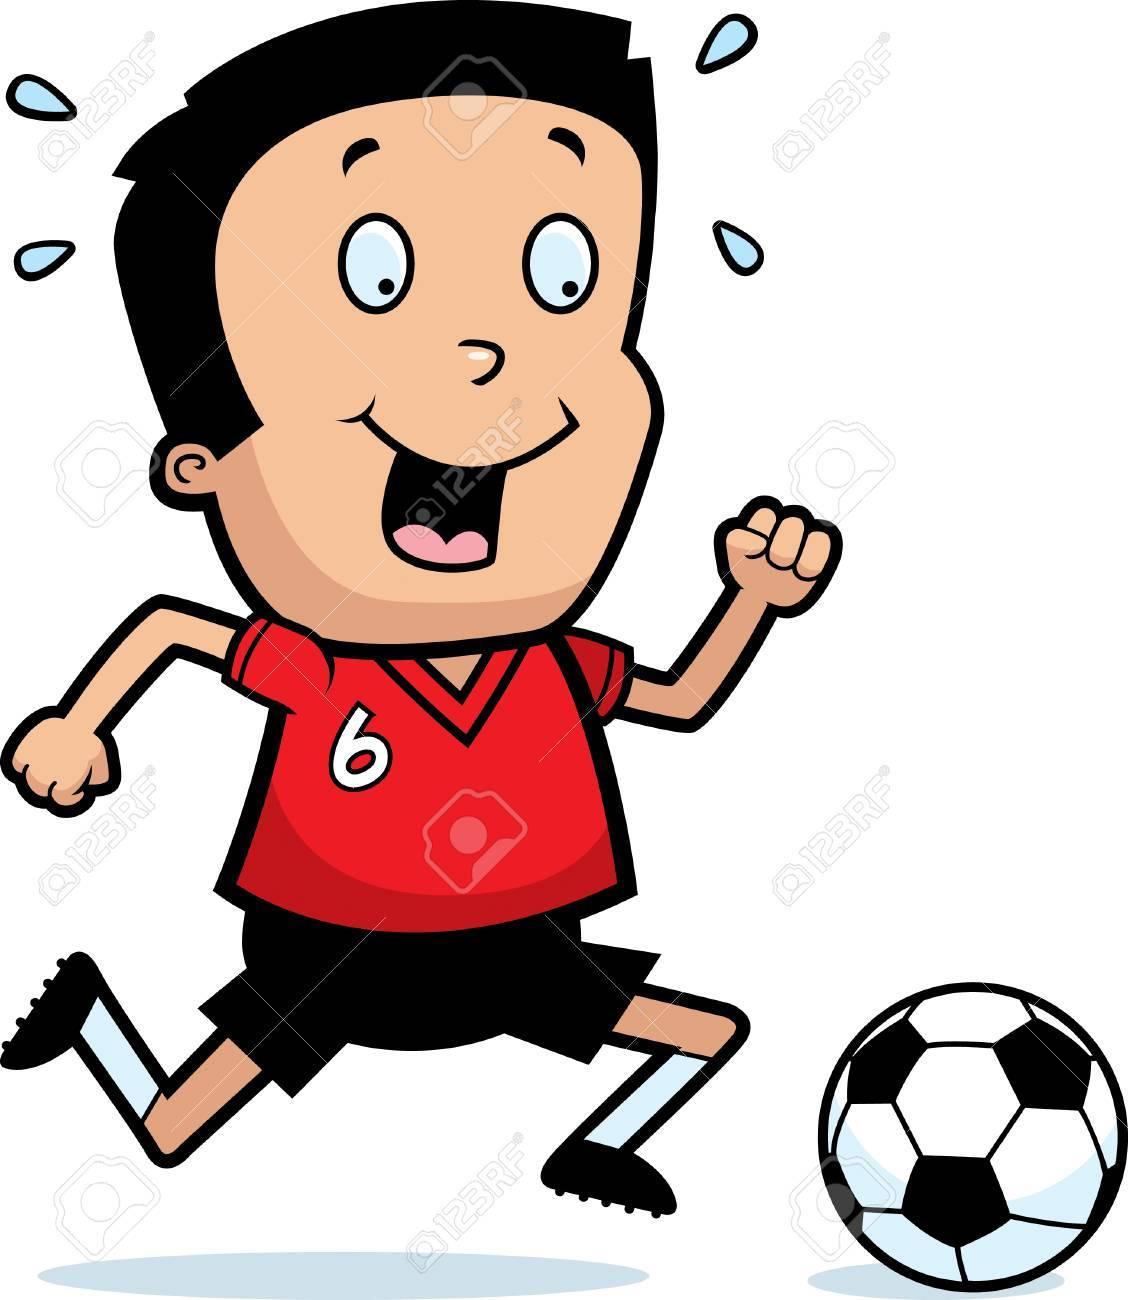 A Cartoon Illustration Of A Boy Playing Soccer